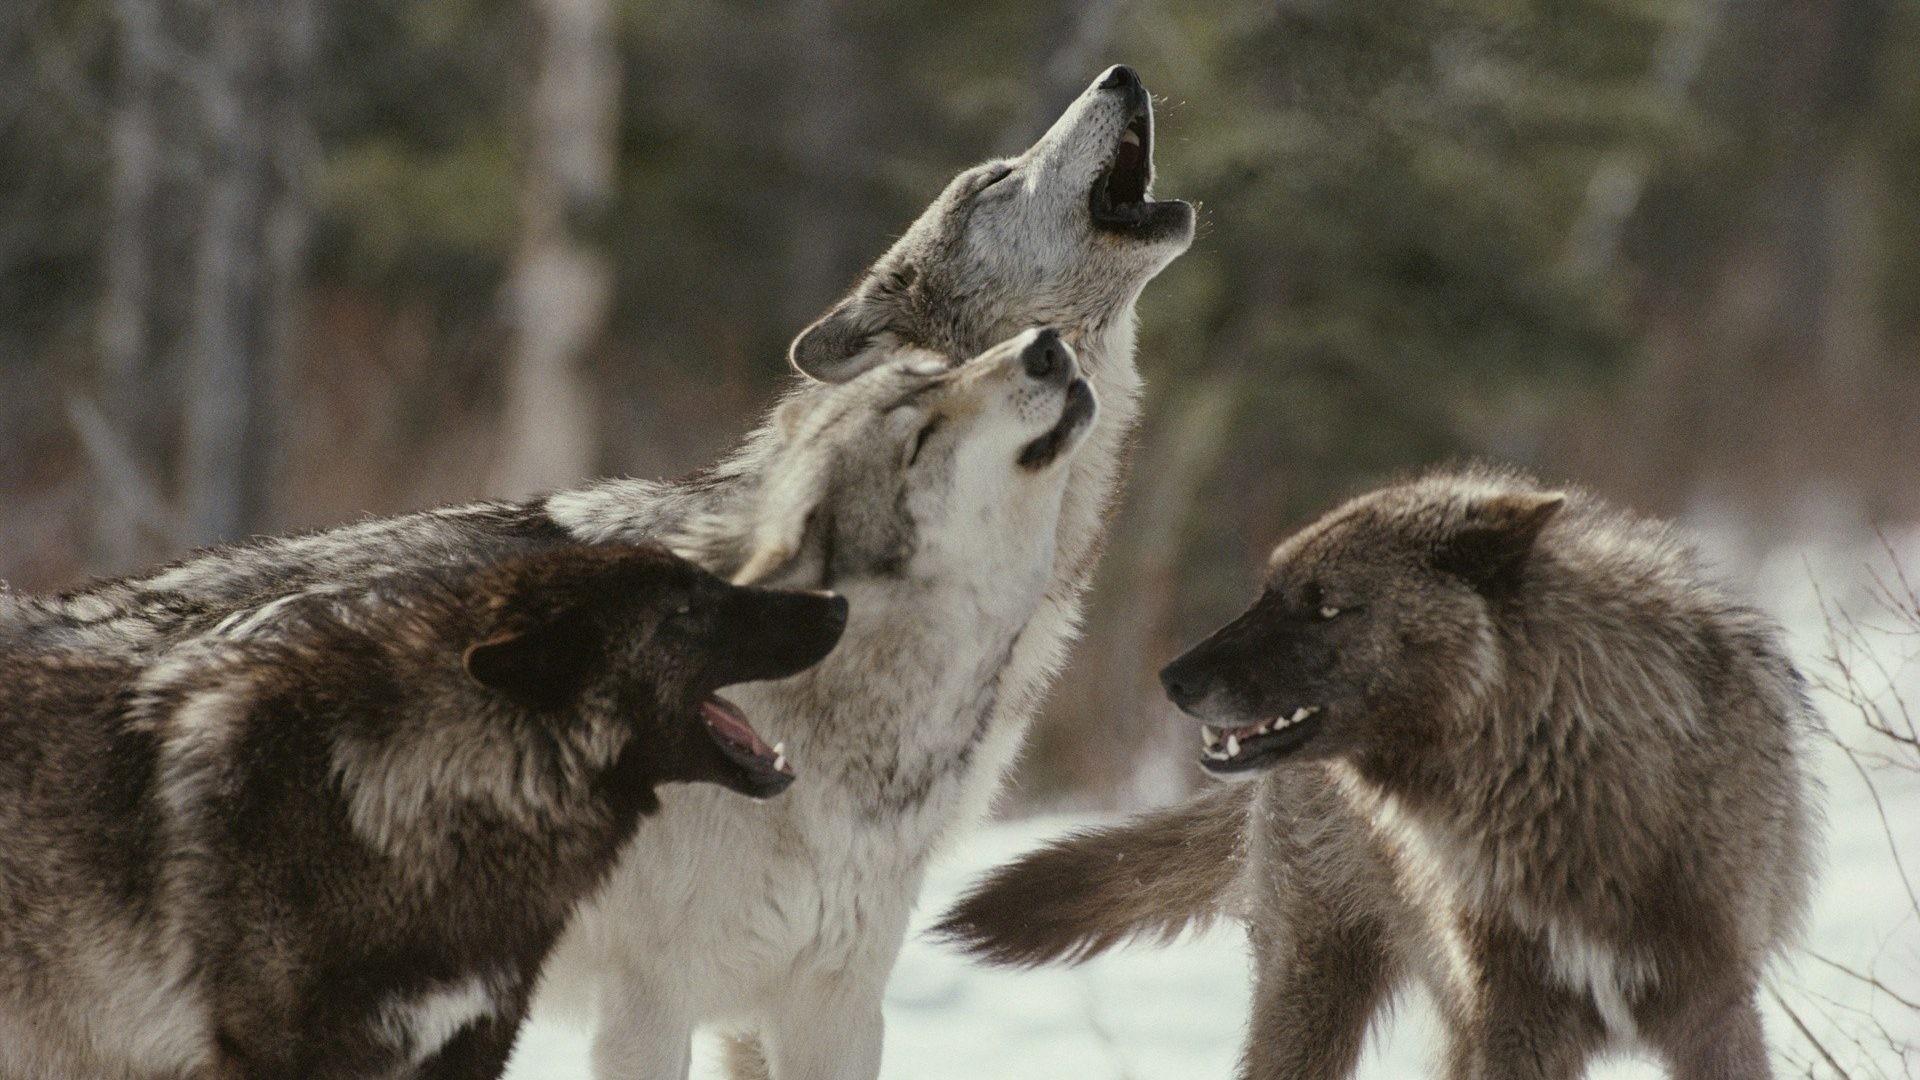 Winter Tag – Snow Predator Wildlife Fangs Fur Trees Winter Muzzle Howl  Animals Emotion Forest Mood